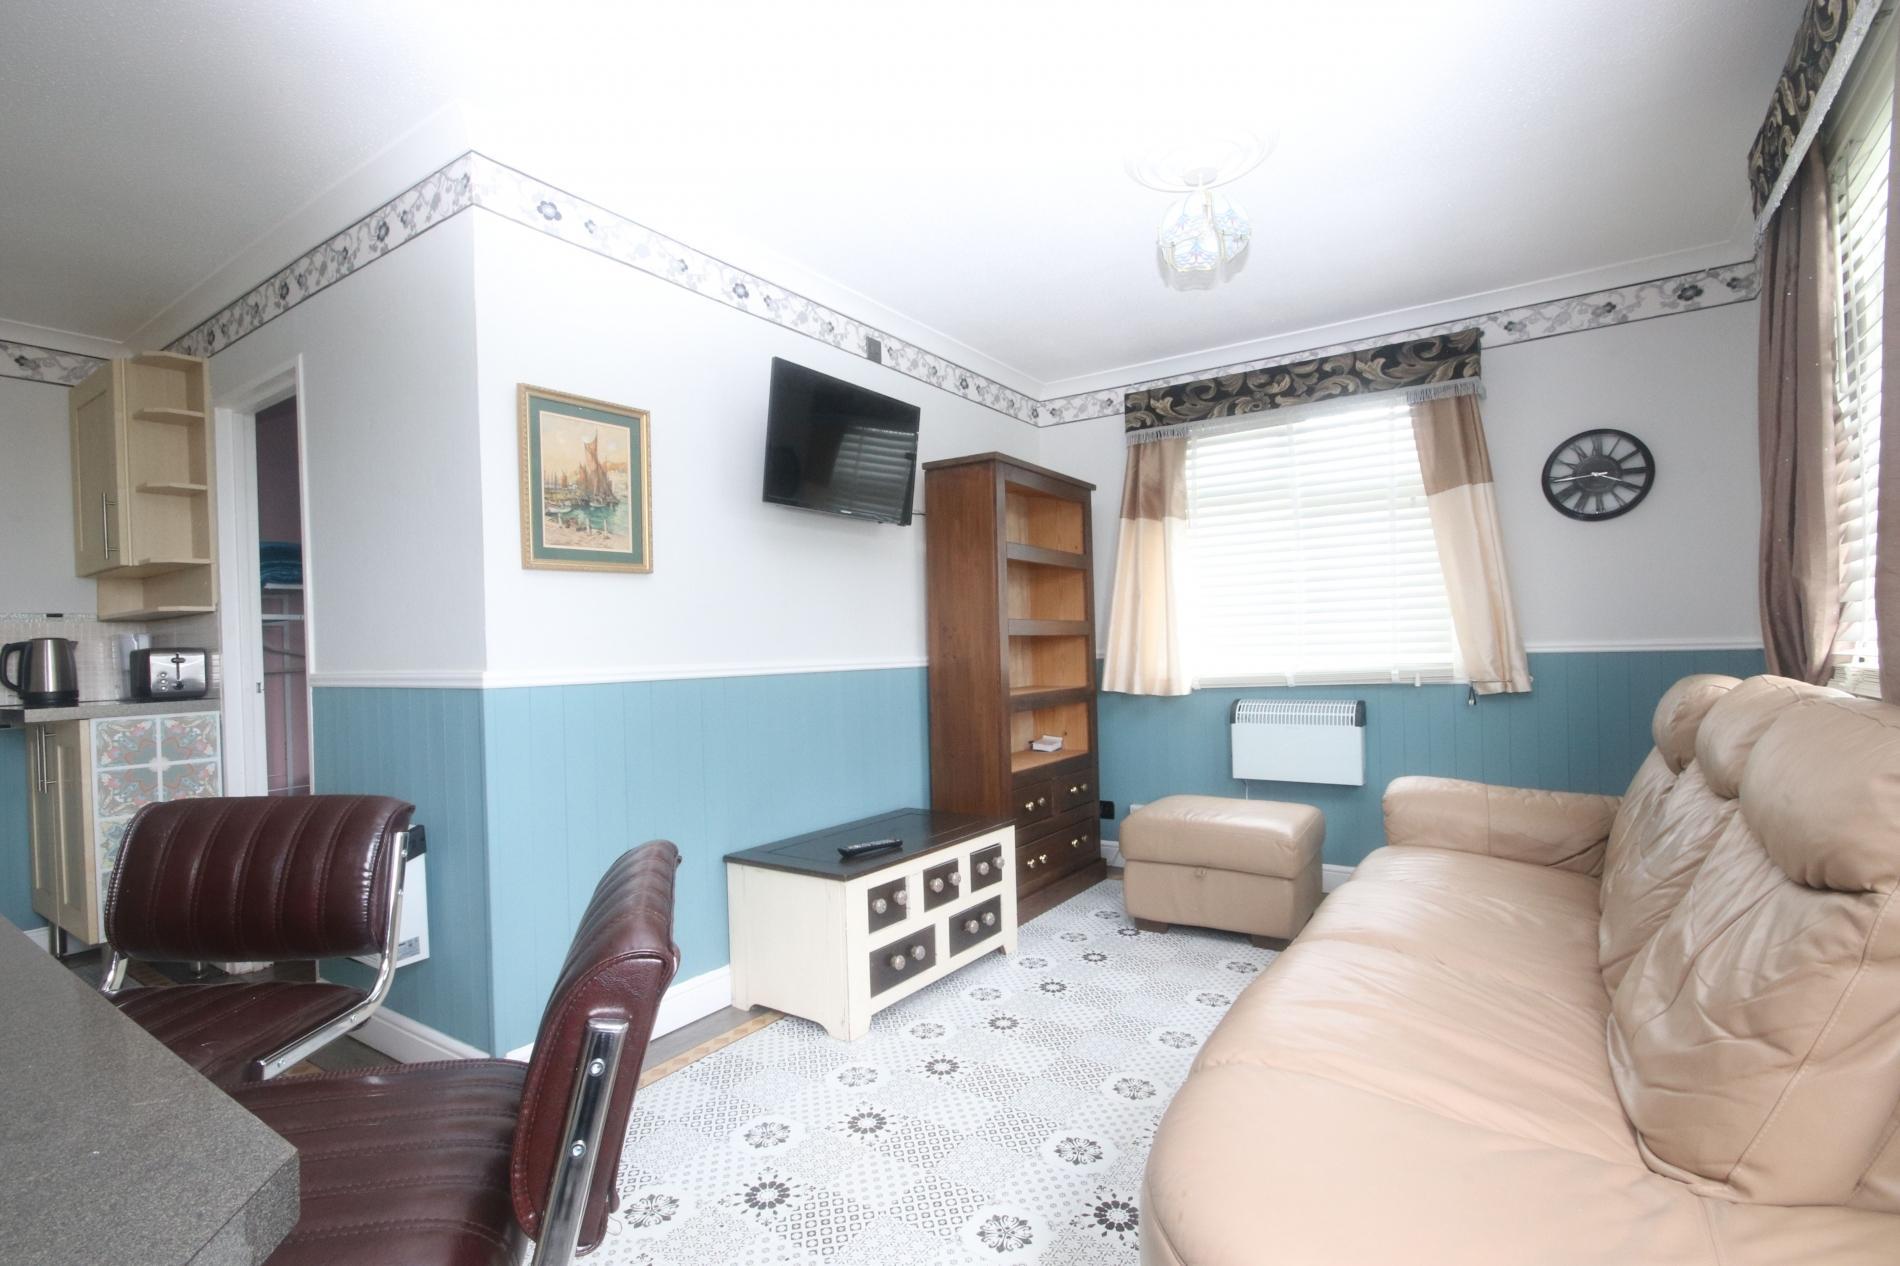 19A Medmerry Park 2 Bedroom Chalet